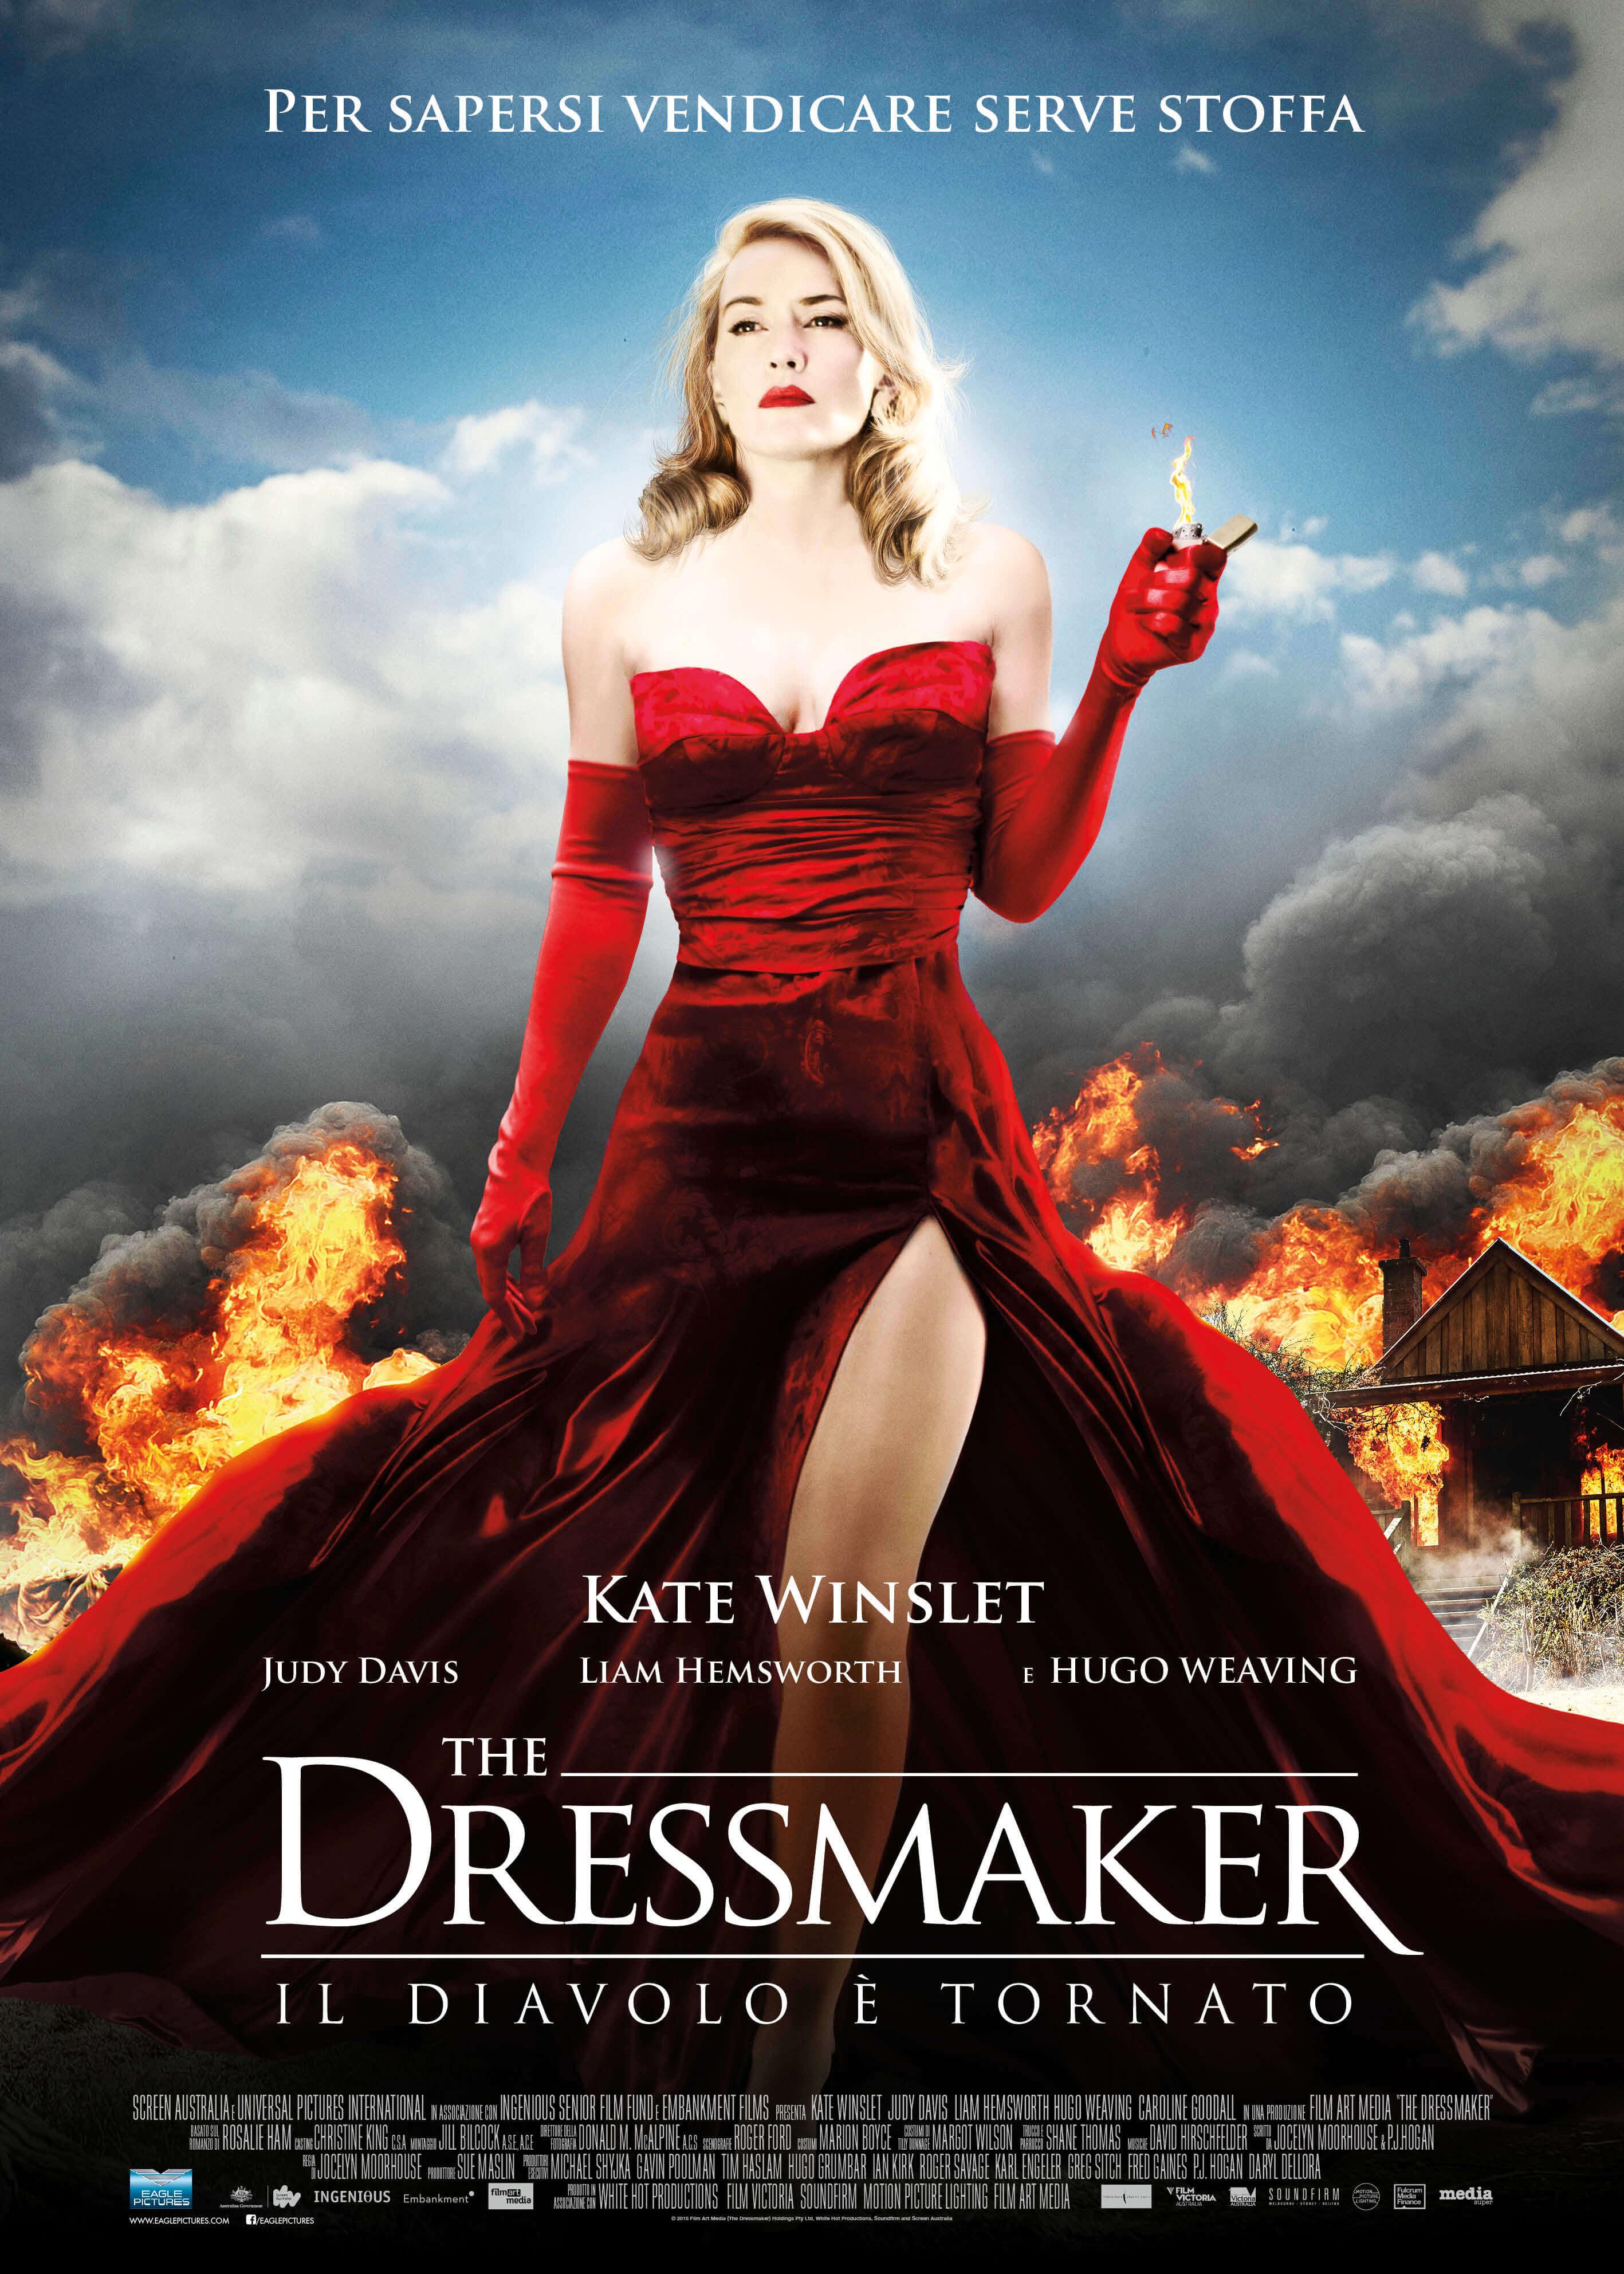 the_dressmaker_kate_winslet_locandina